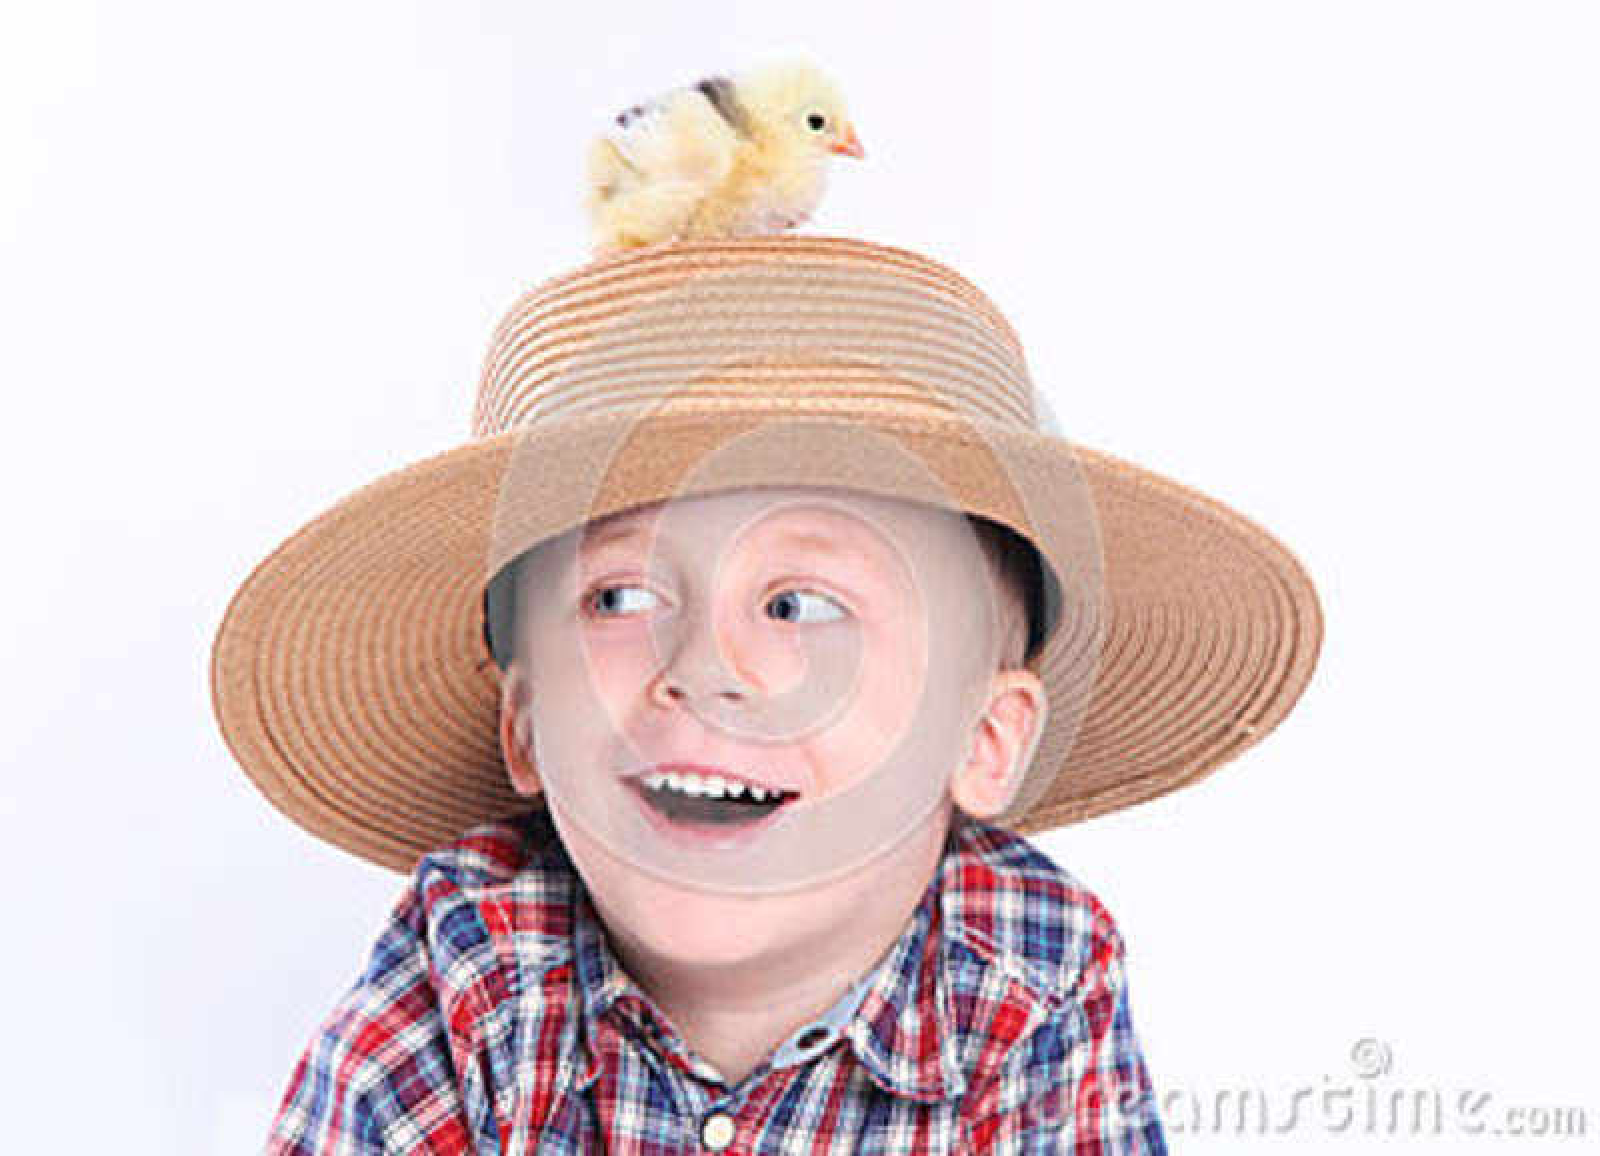 Pintainho no chapéu